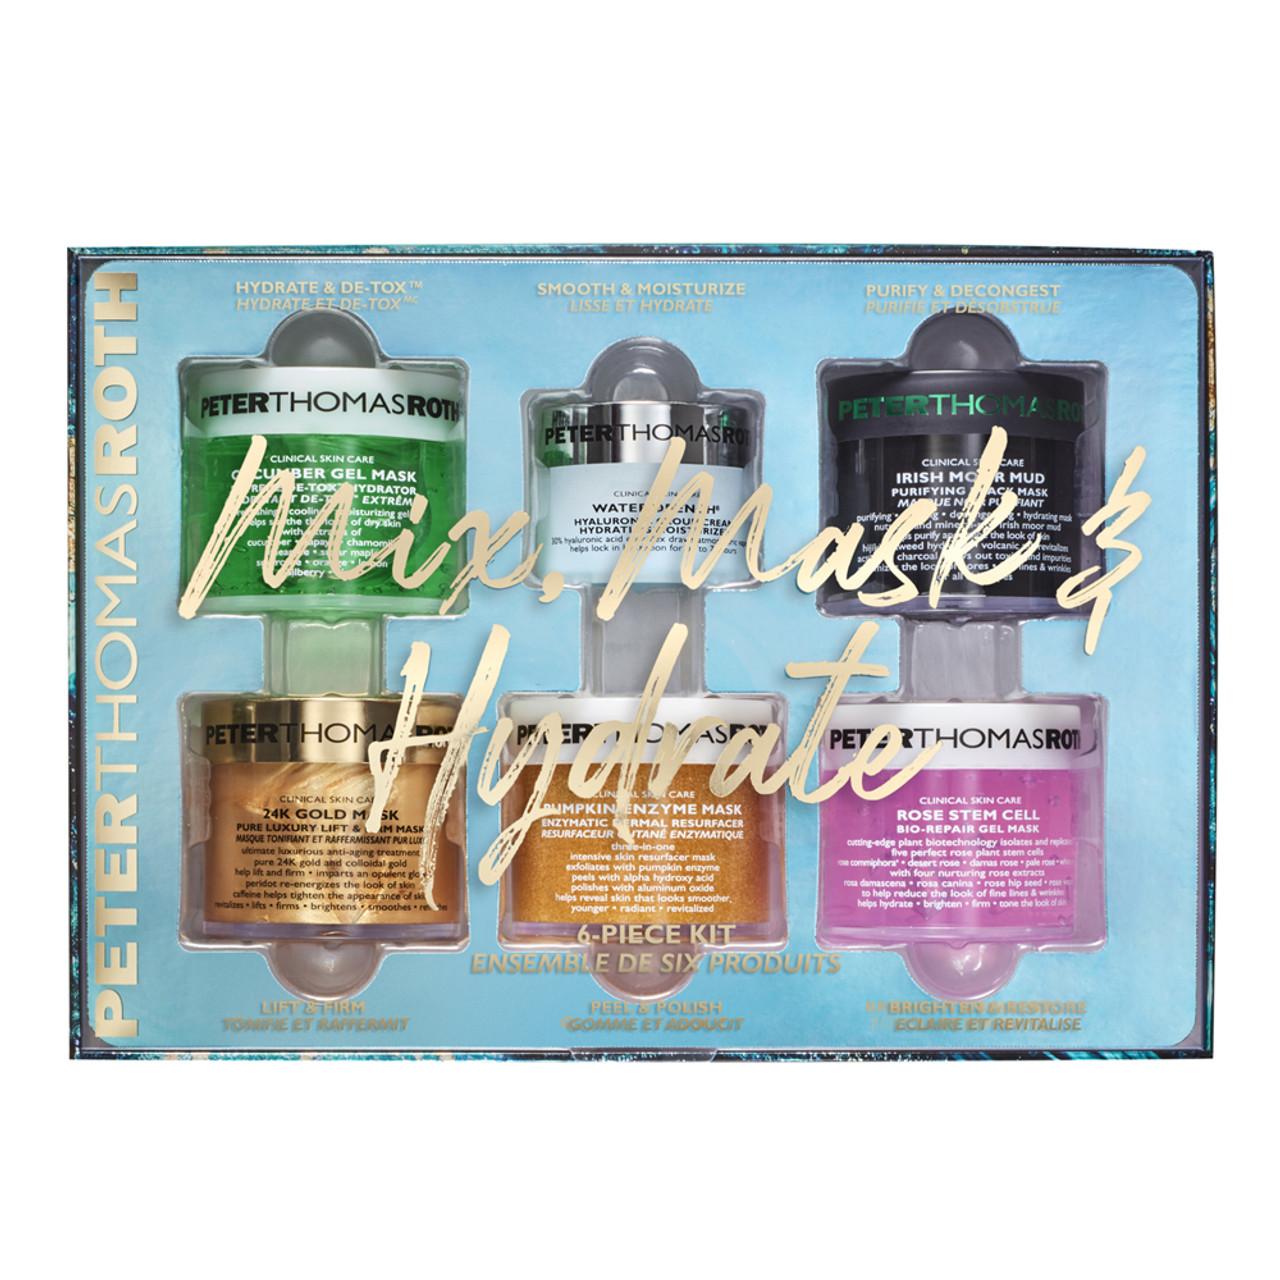 Peter Thomas Roth Mix, Mask & Hydrate 6-Piece Kit BeautifiedYou.com